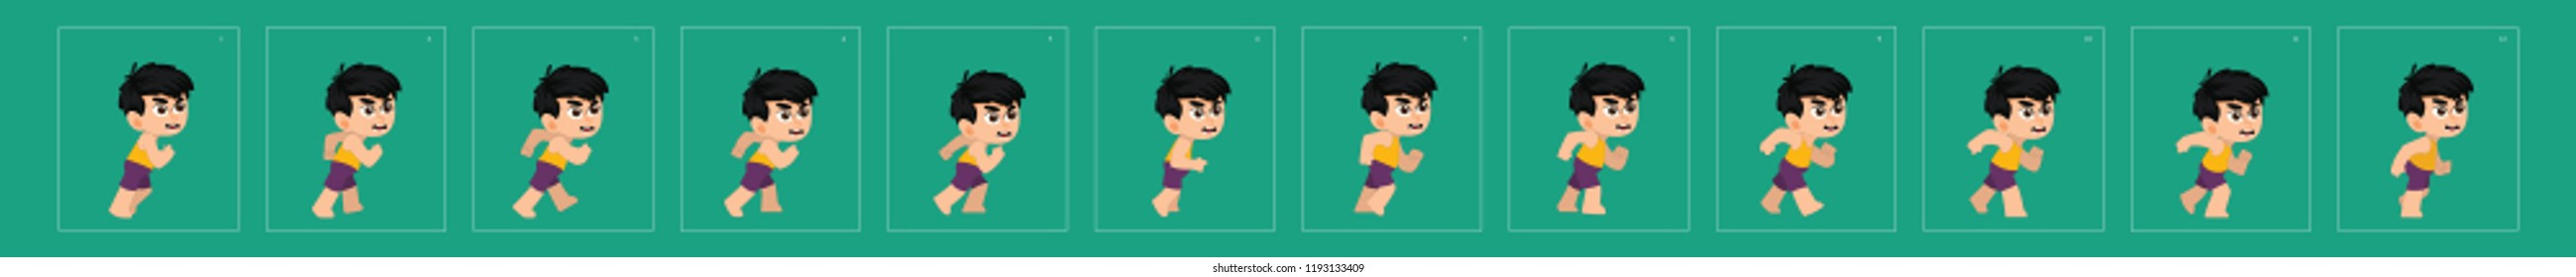 Boy walk cycle. animation walk cycle. walking animation sprite sheets